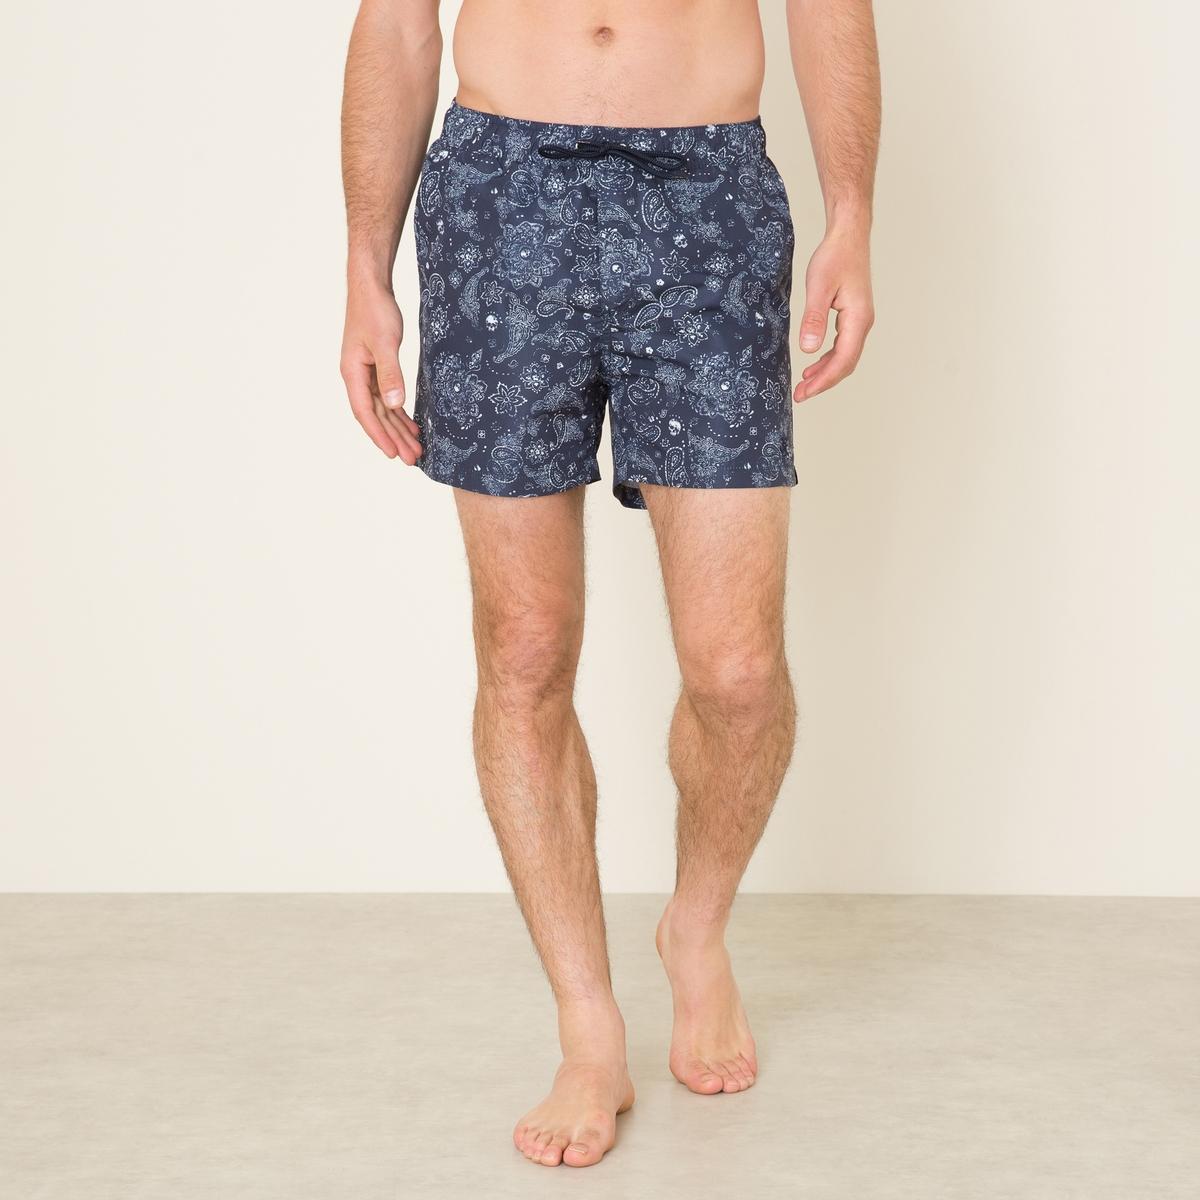 Плавки-боксеры the kooples шорты для плавания